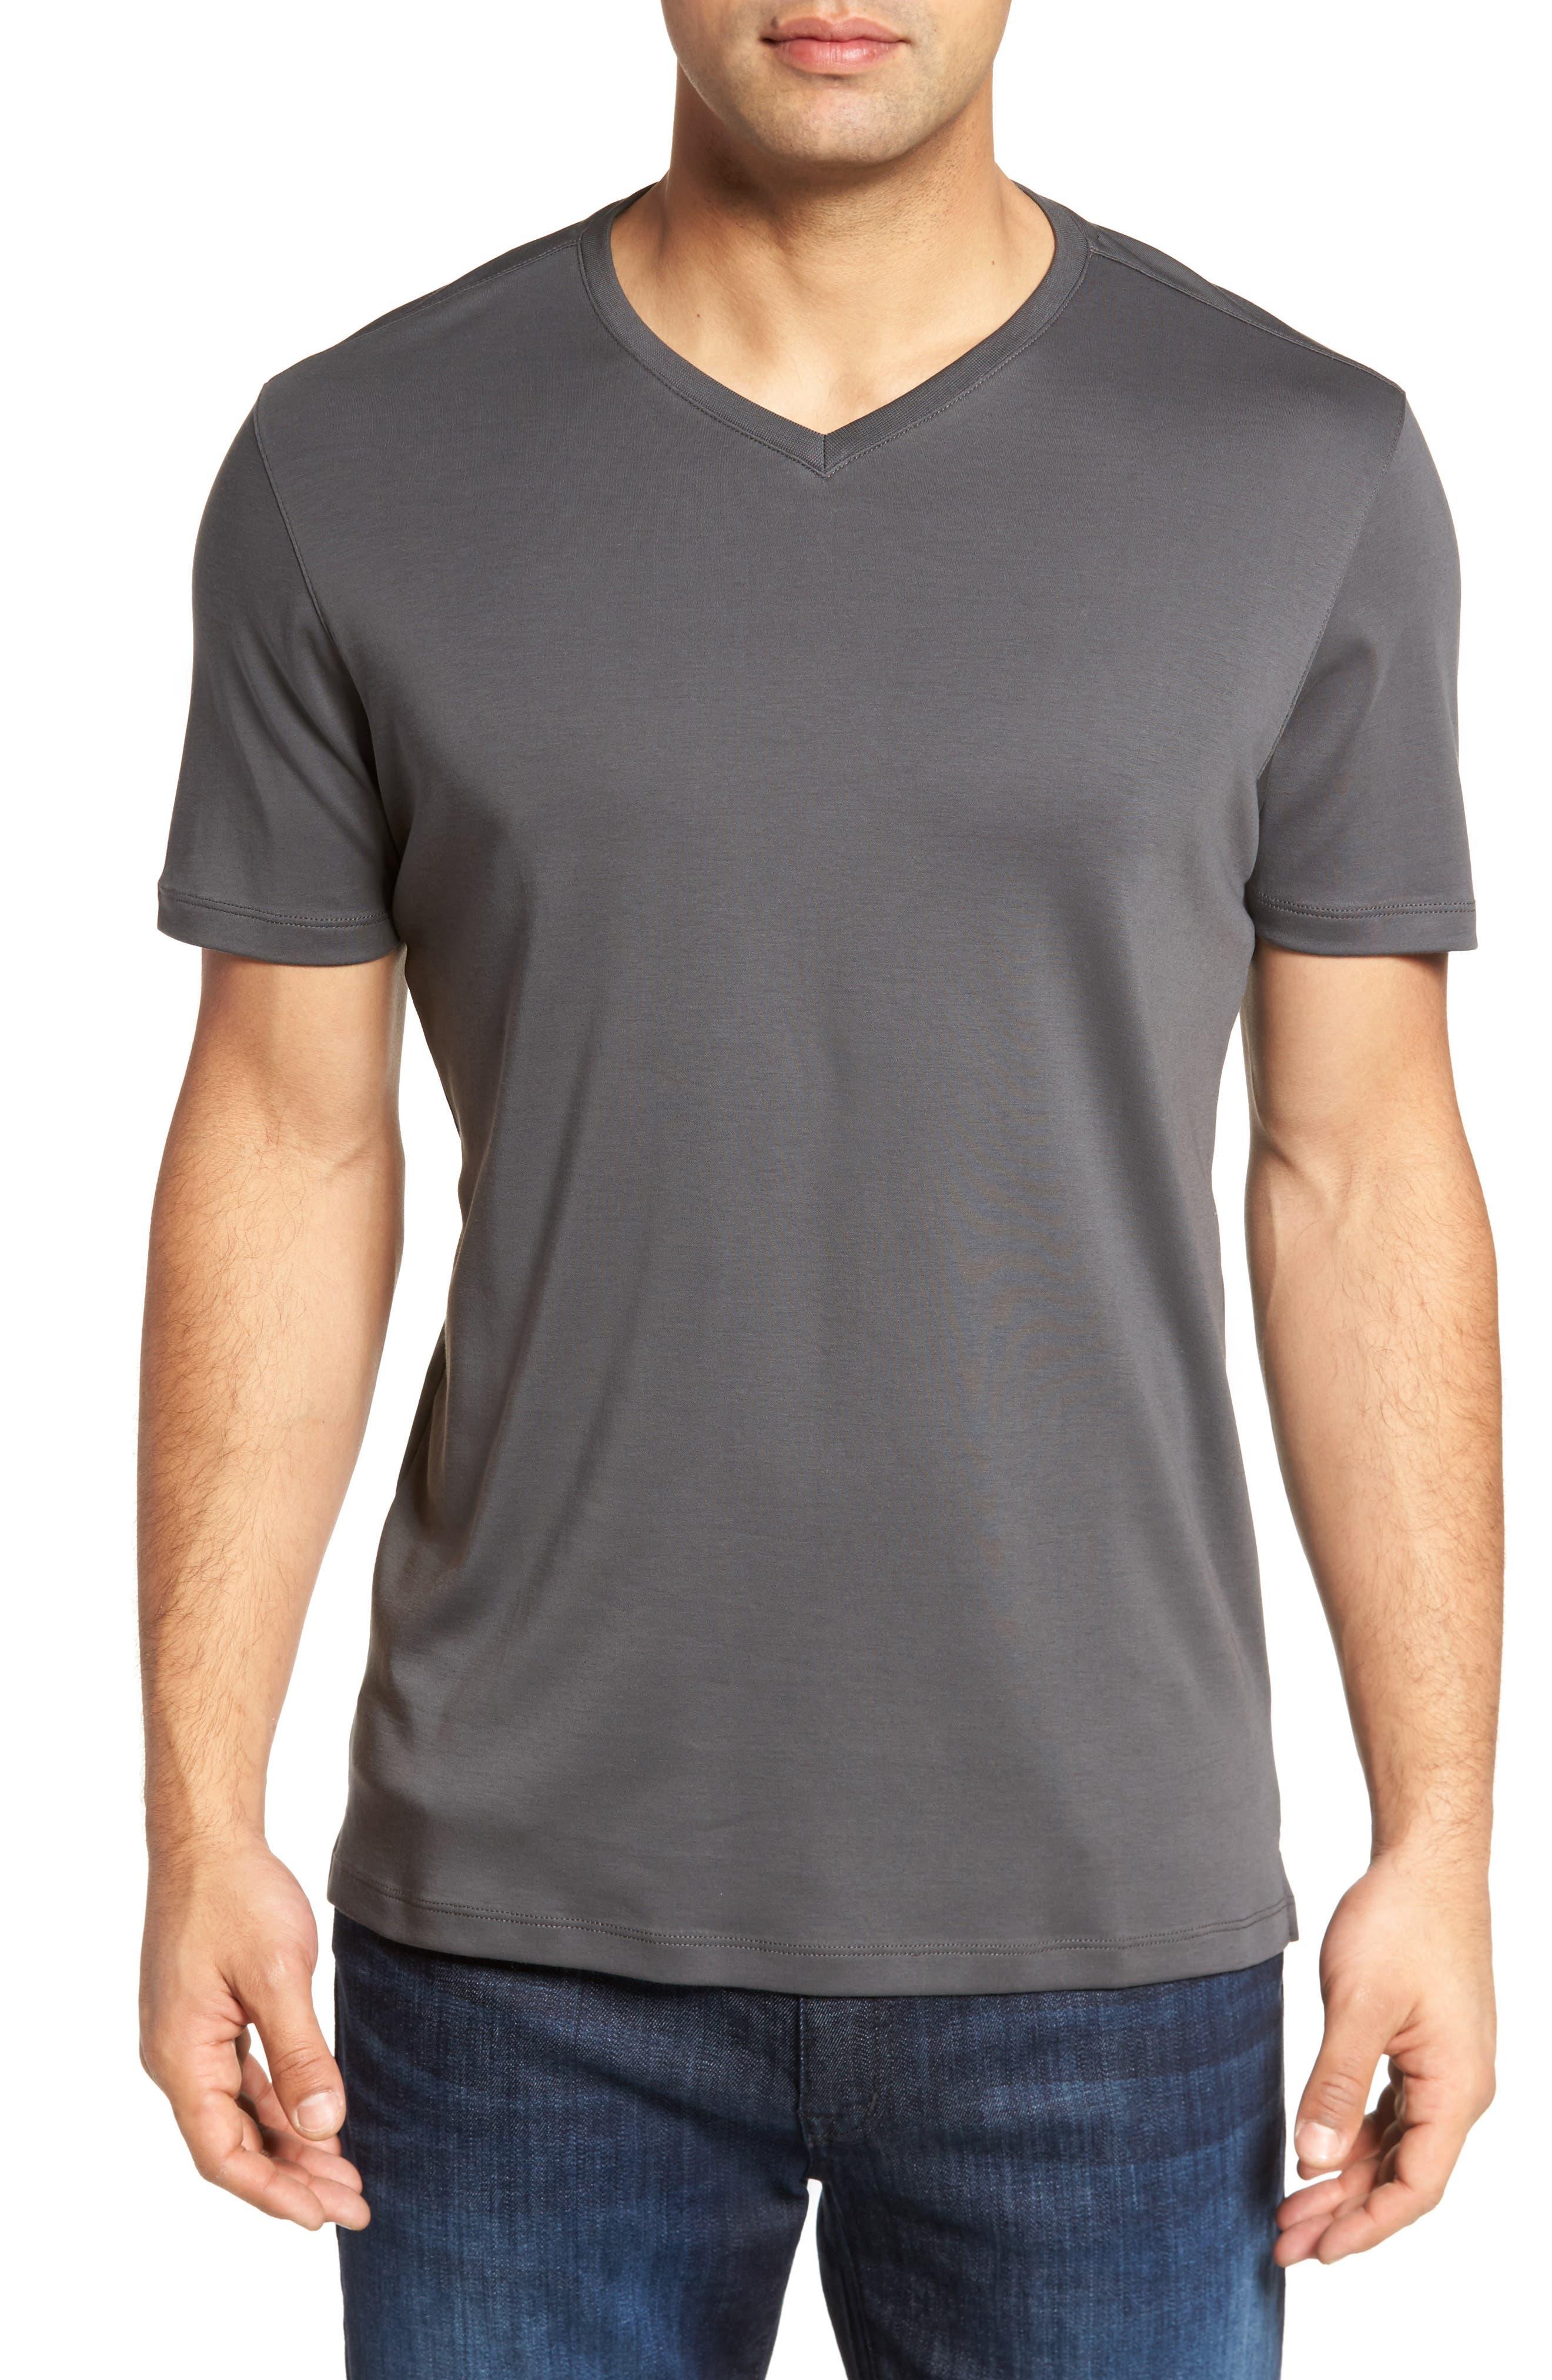 ROBERT BARAKETT, Georgia Regular Fit V-Neck T-Shirt, Main thumbnail 1, color, IRON